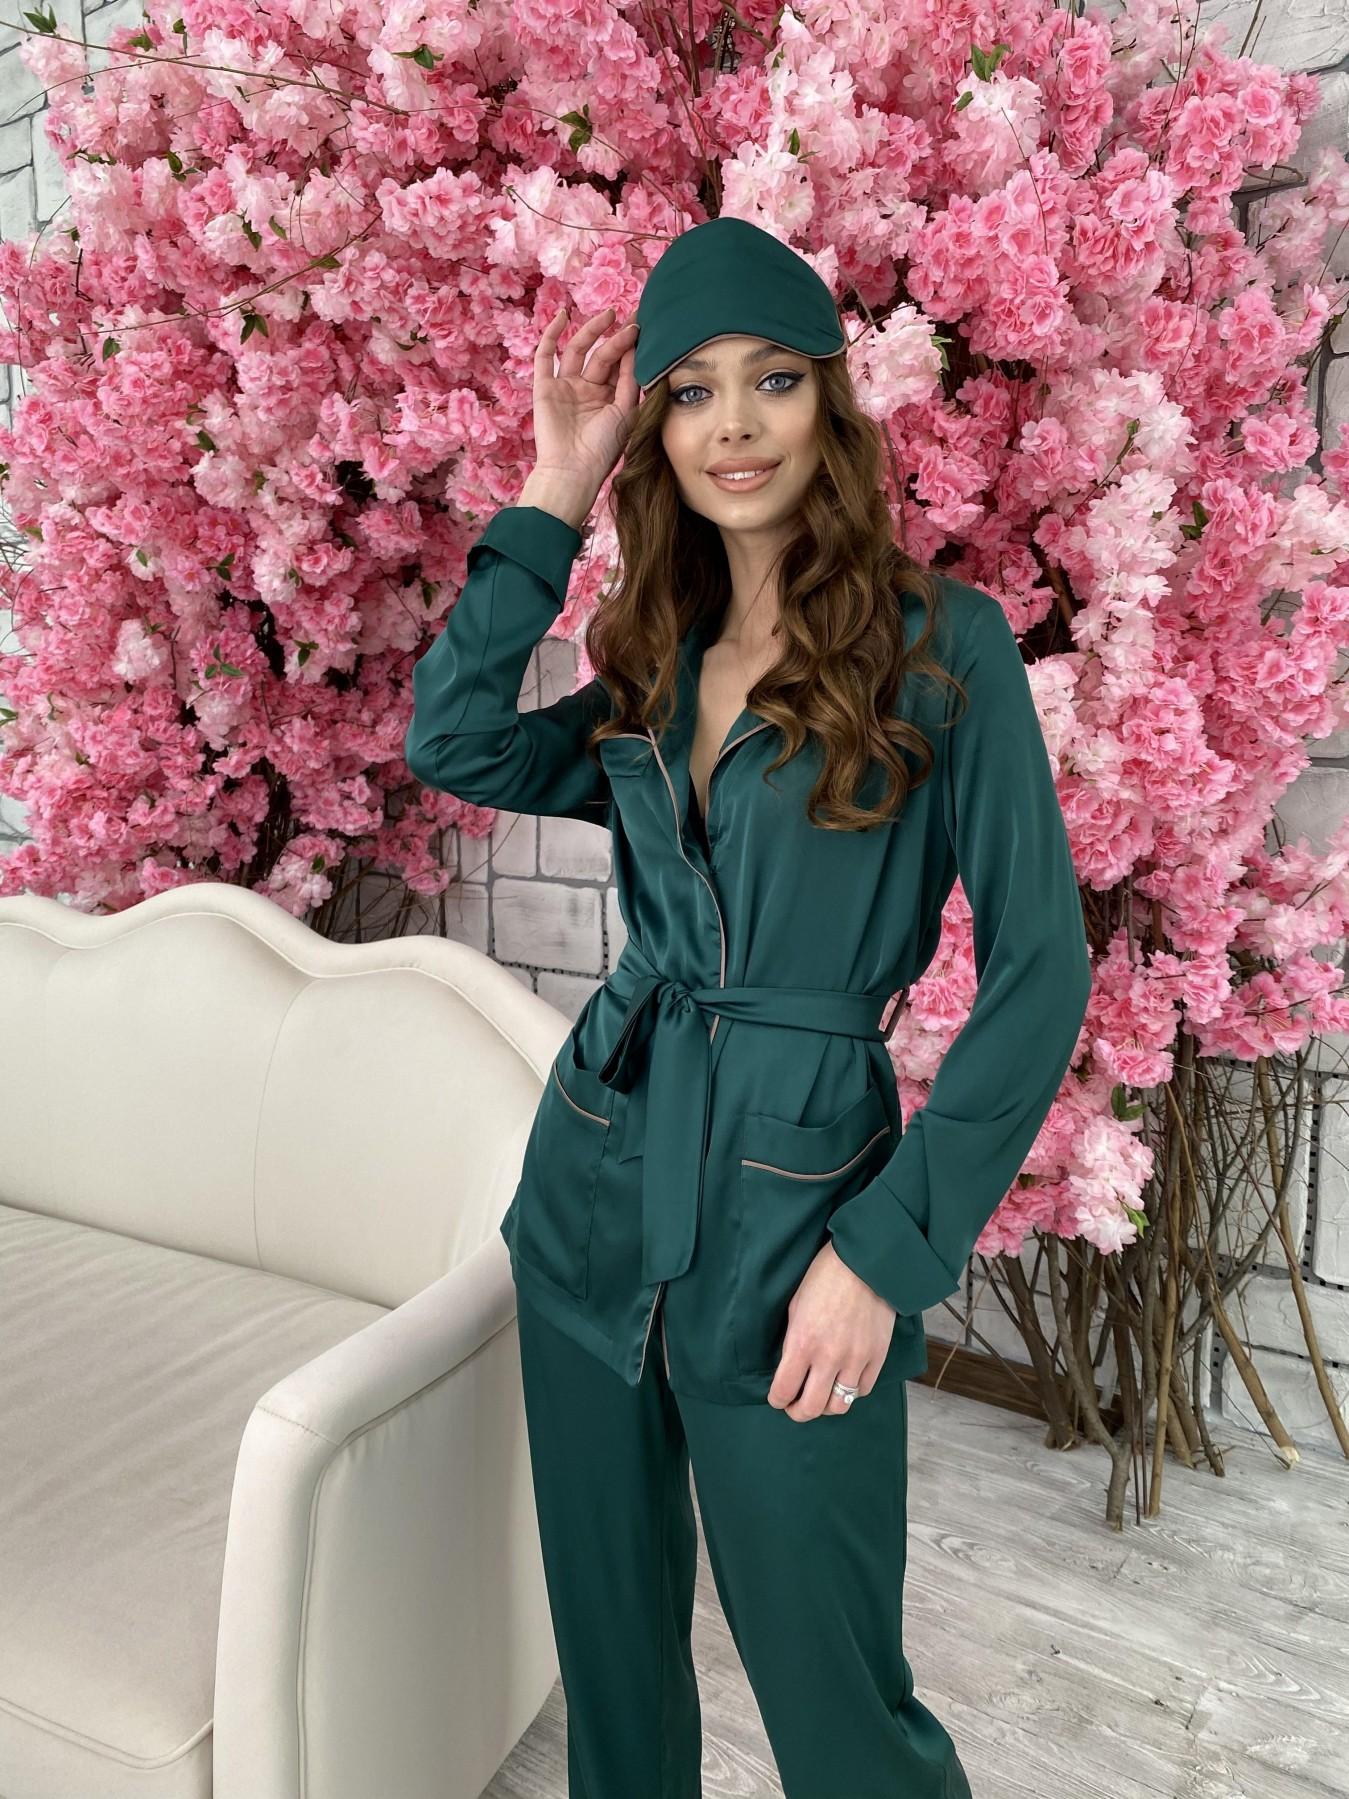 Шайн костюм из шелка  10778 АРТ. 47212 Цвет: Темно зеленый - фото 5, интернет магазин tm-modus.ru